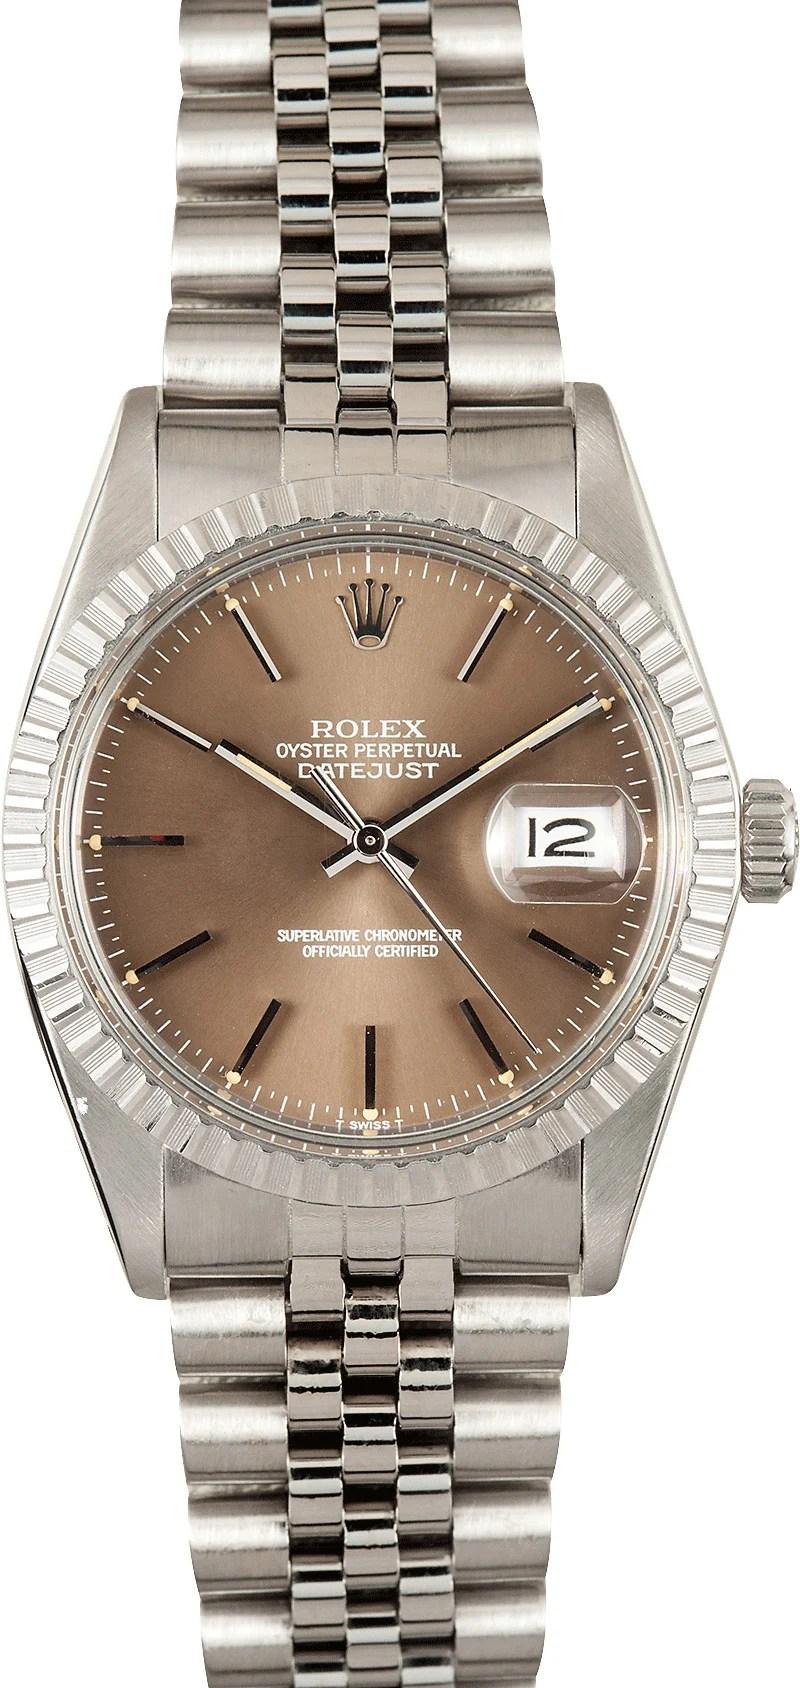 Mens Rolex Datejust 16030 Bronze Dial Buy Rolex At Bobs